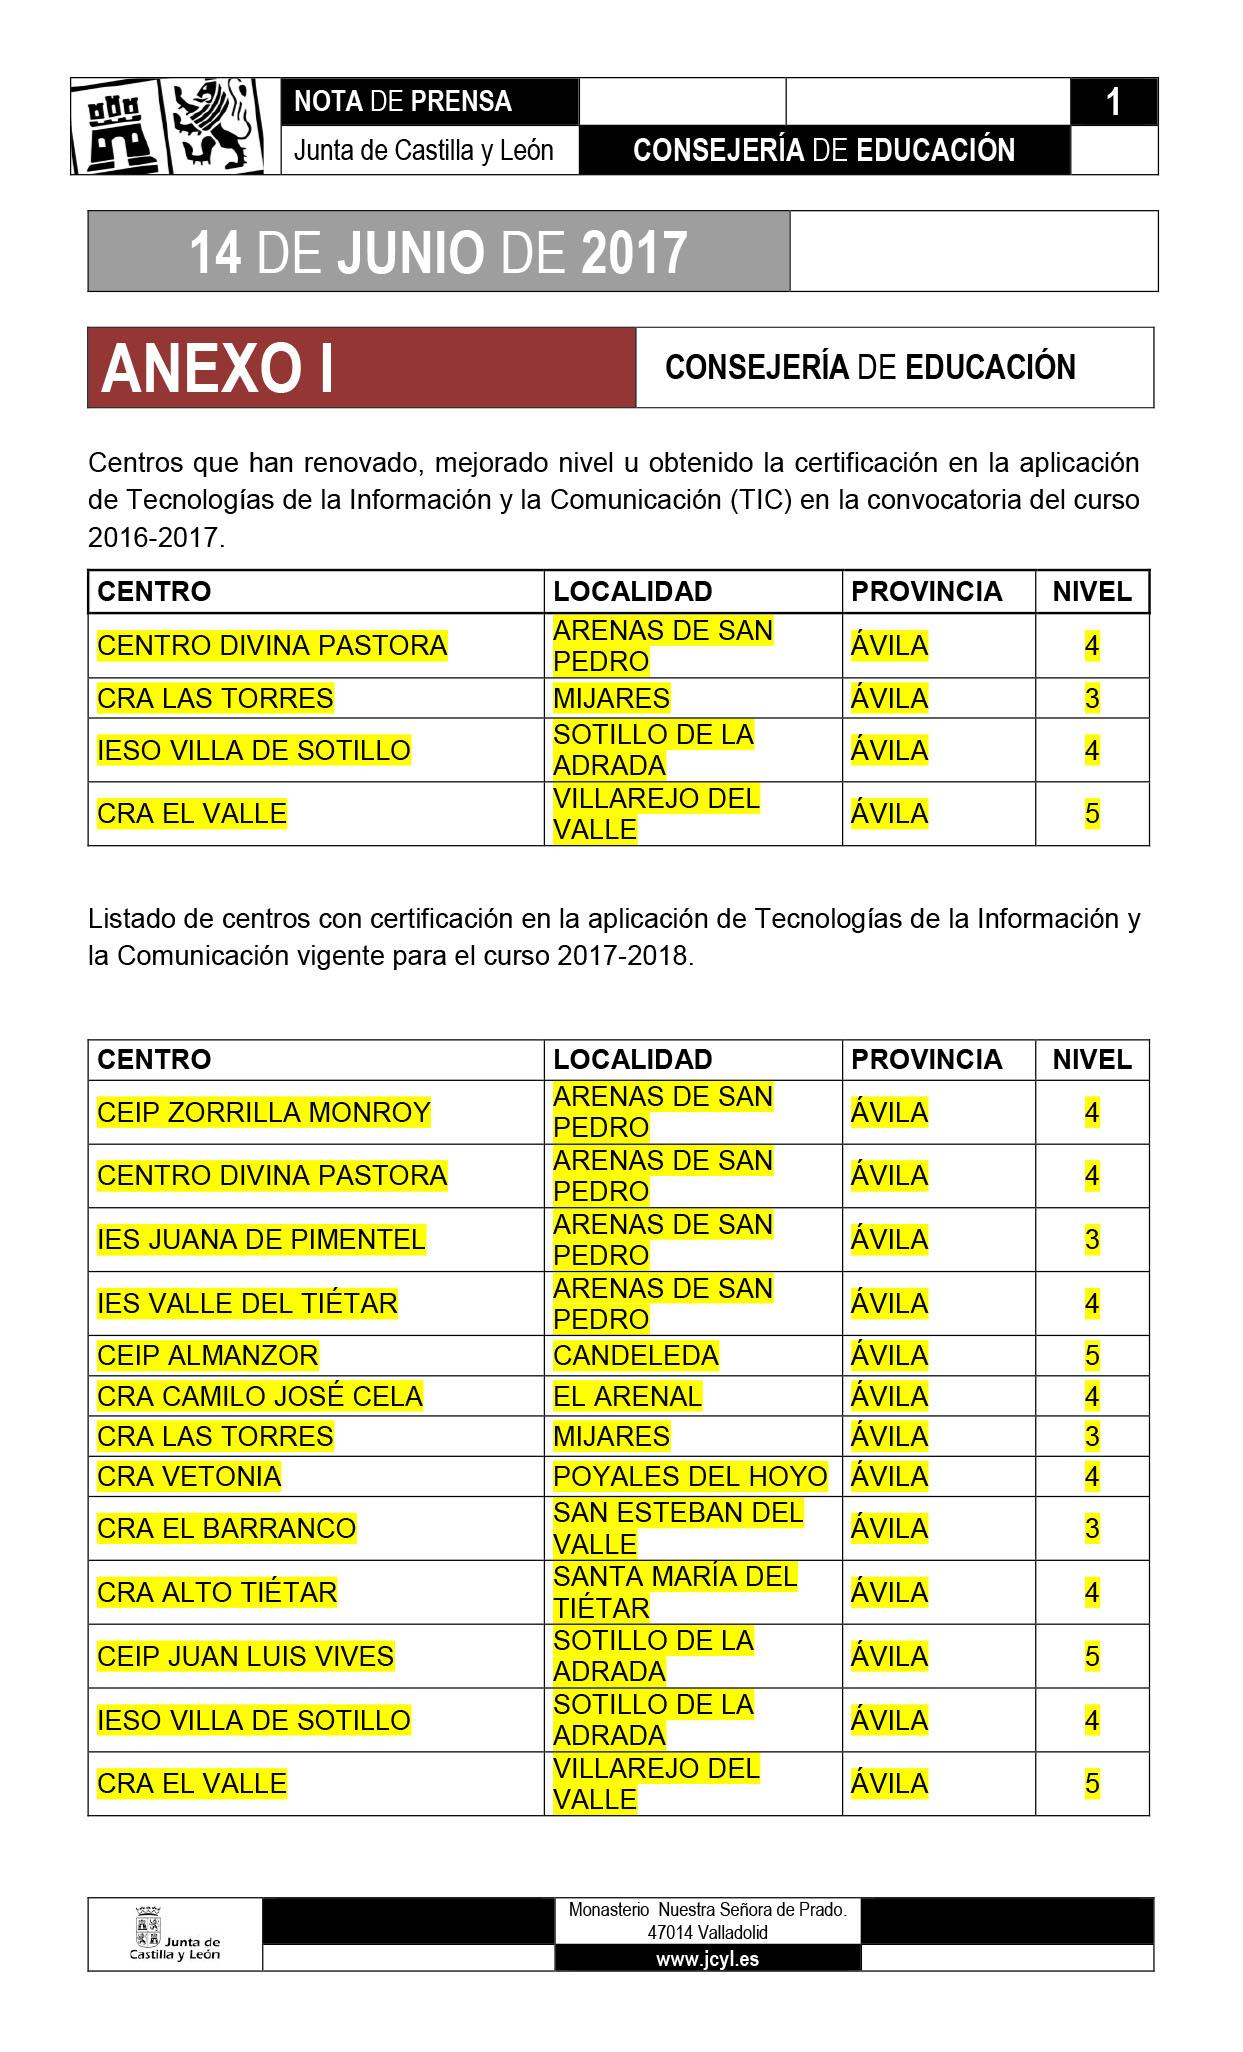 Certificacion TIC JCyL Valle del Tiétar - TiétarTeVe